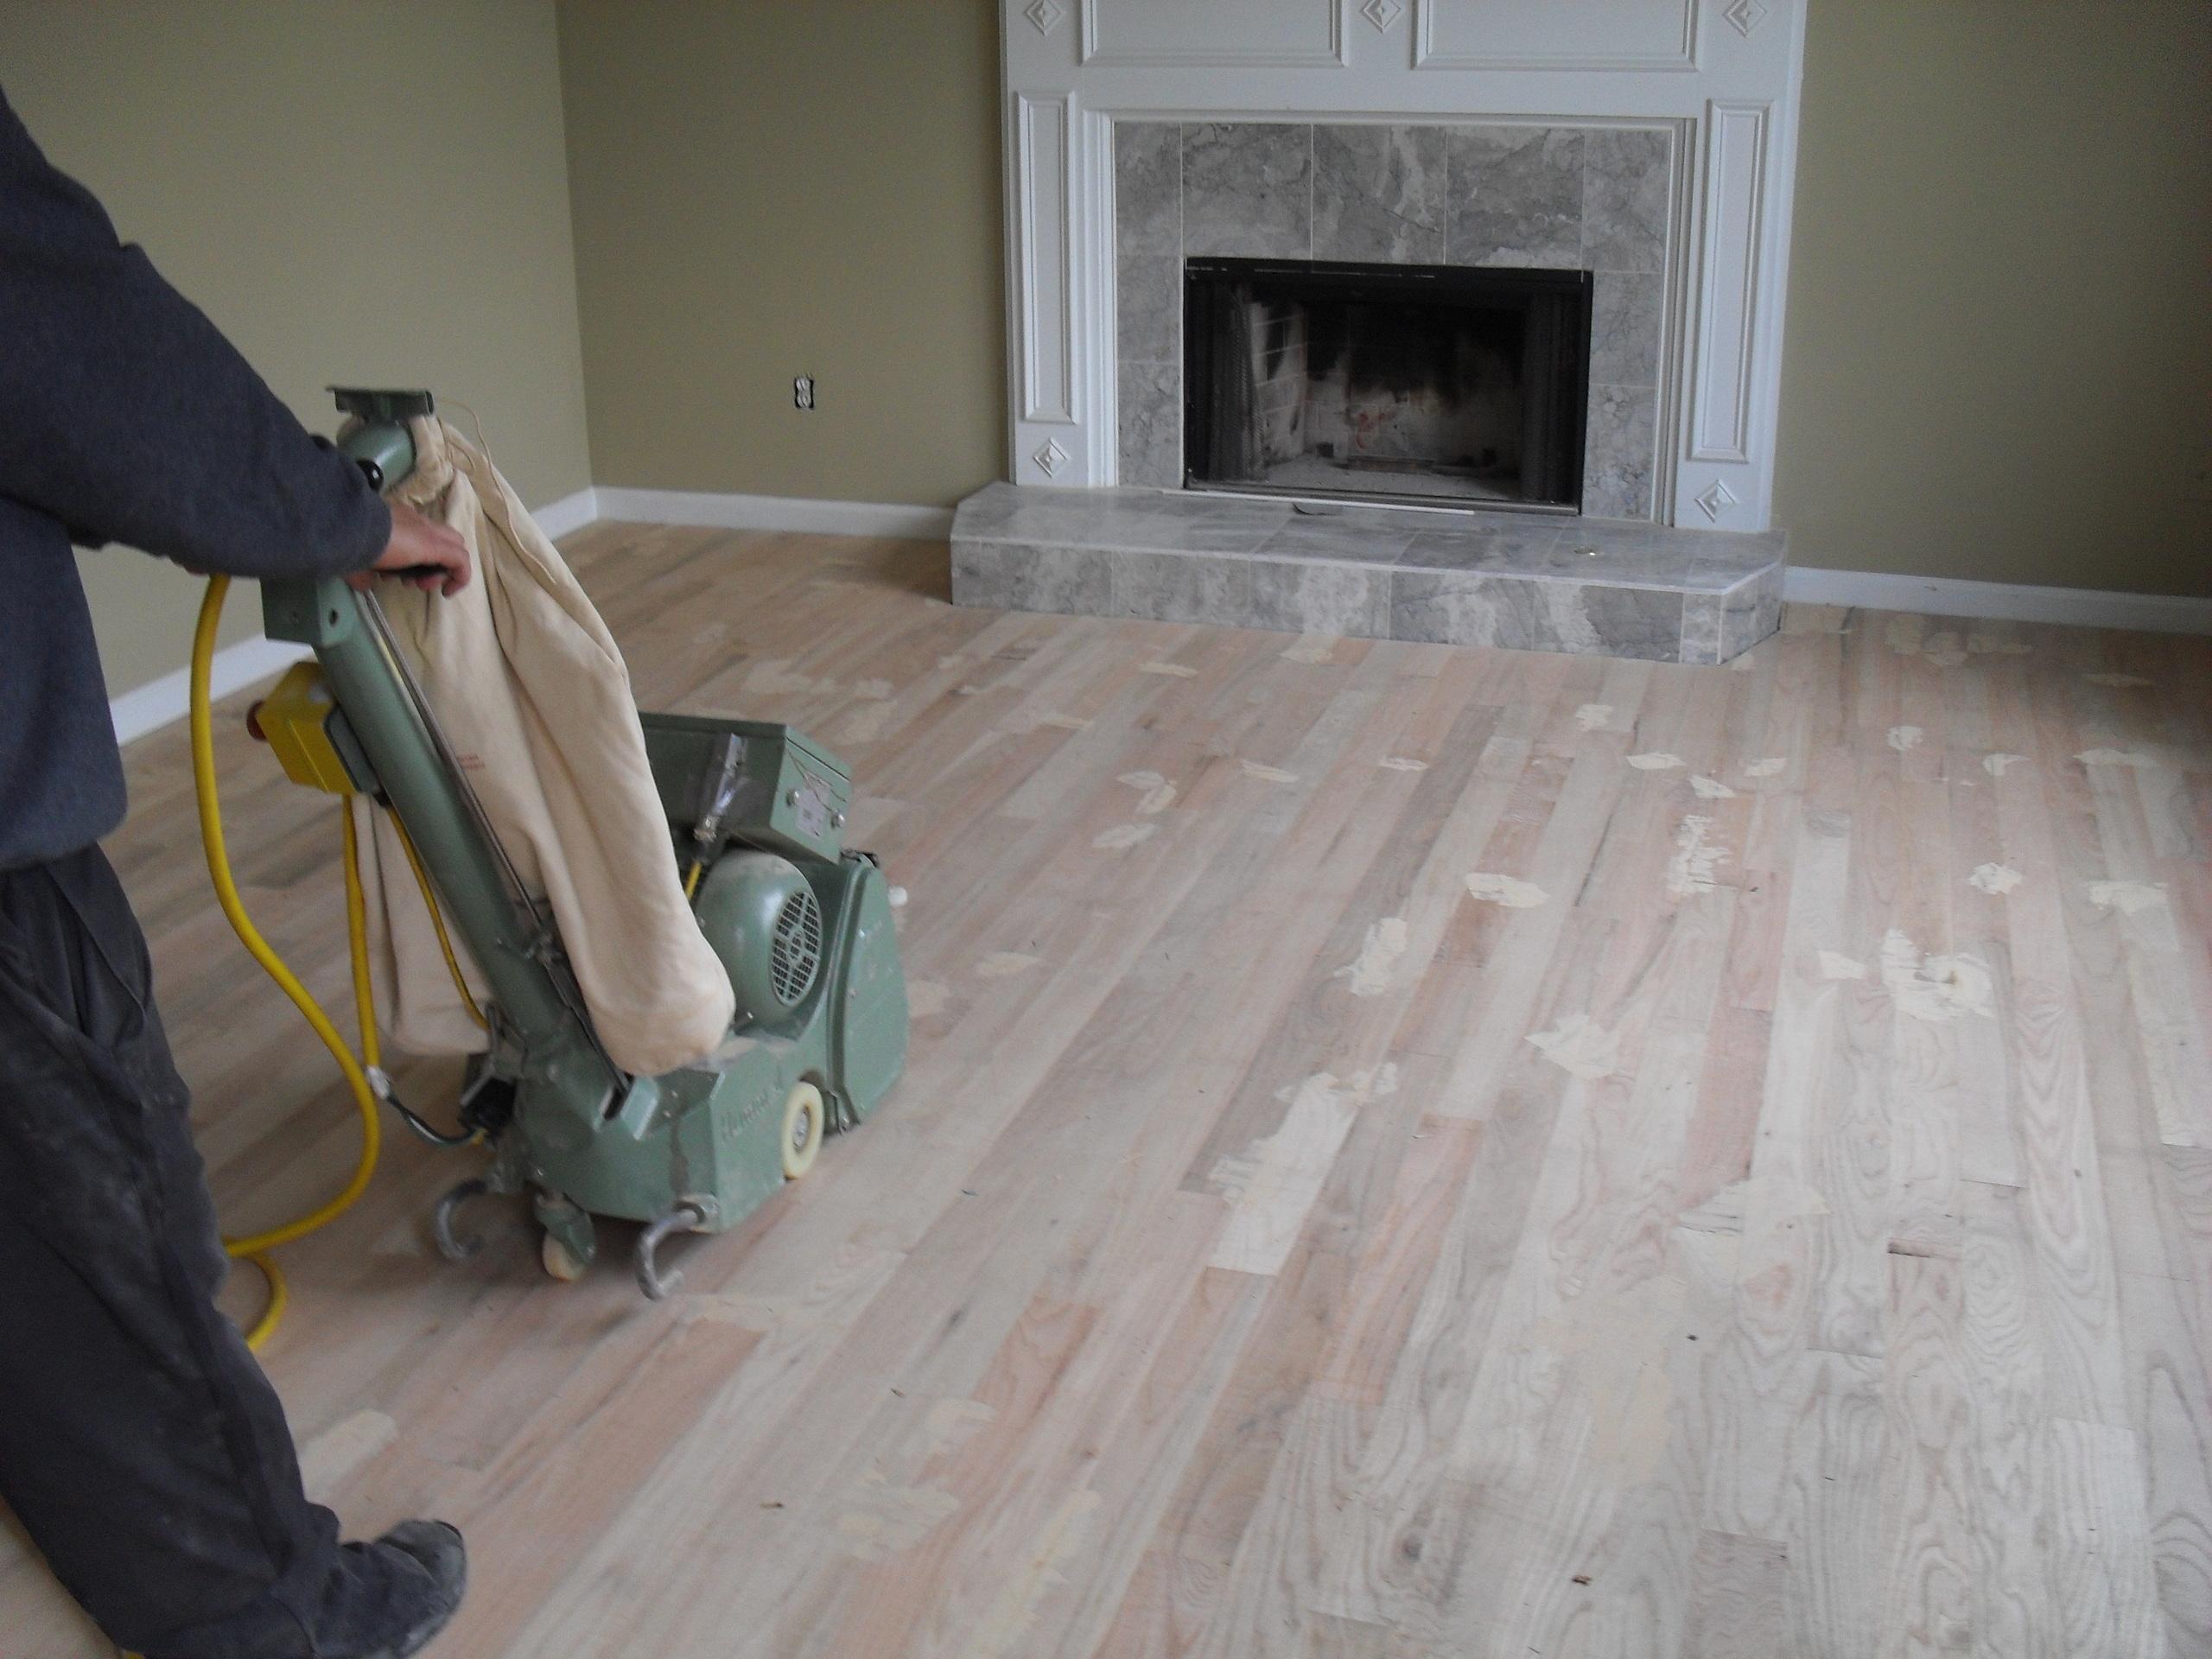 Sanding wood floors  Wood floors Photo 18331048  Fanpop